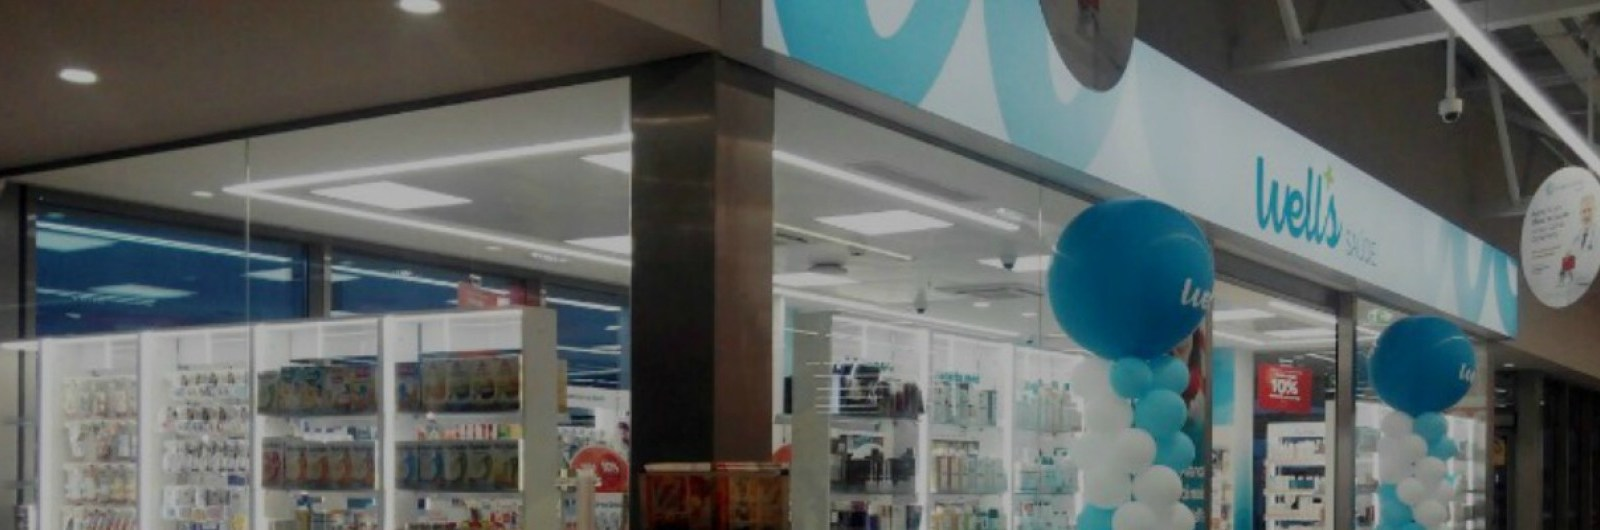 Well's abre loja em Avanca